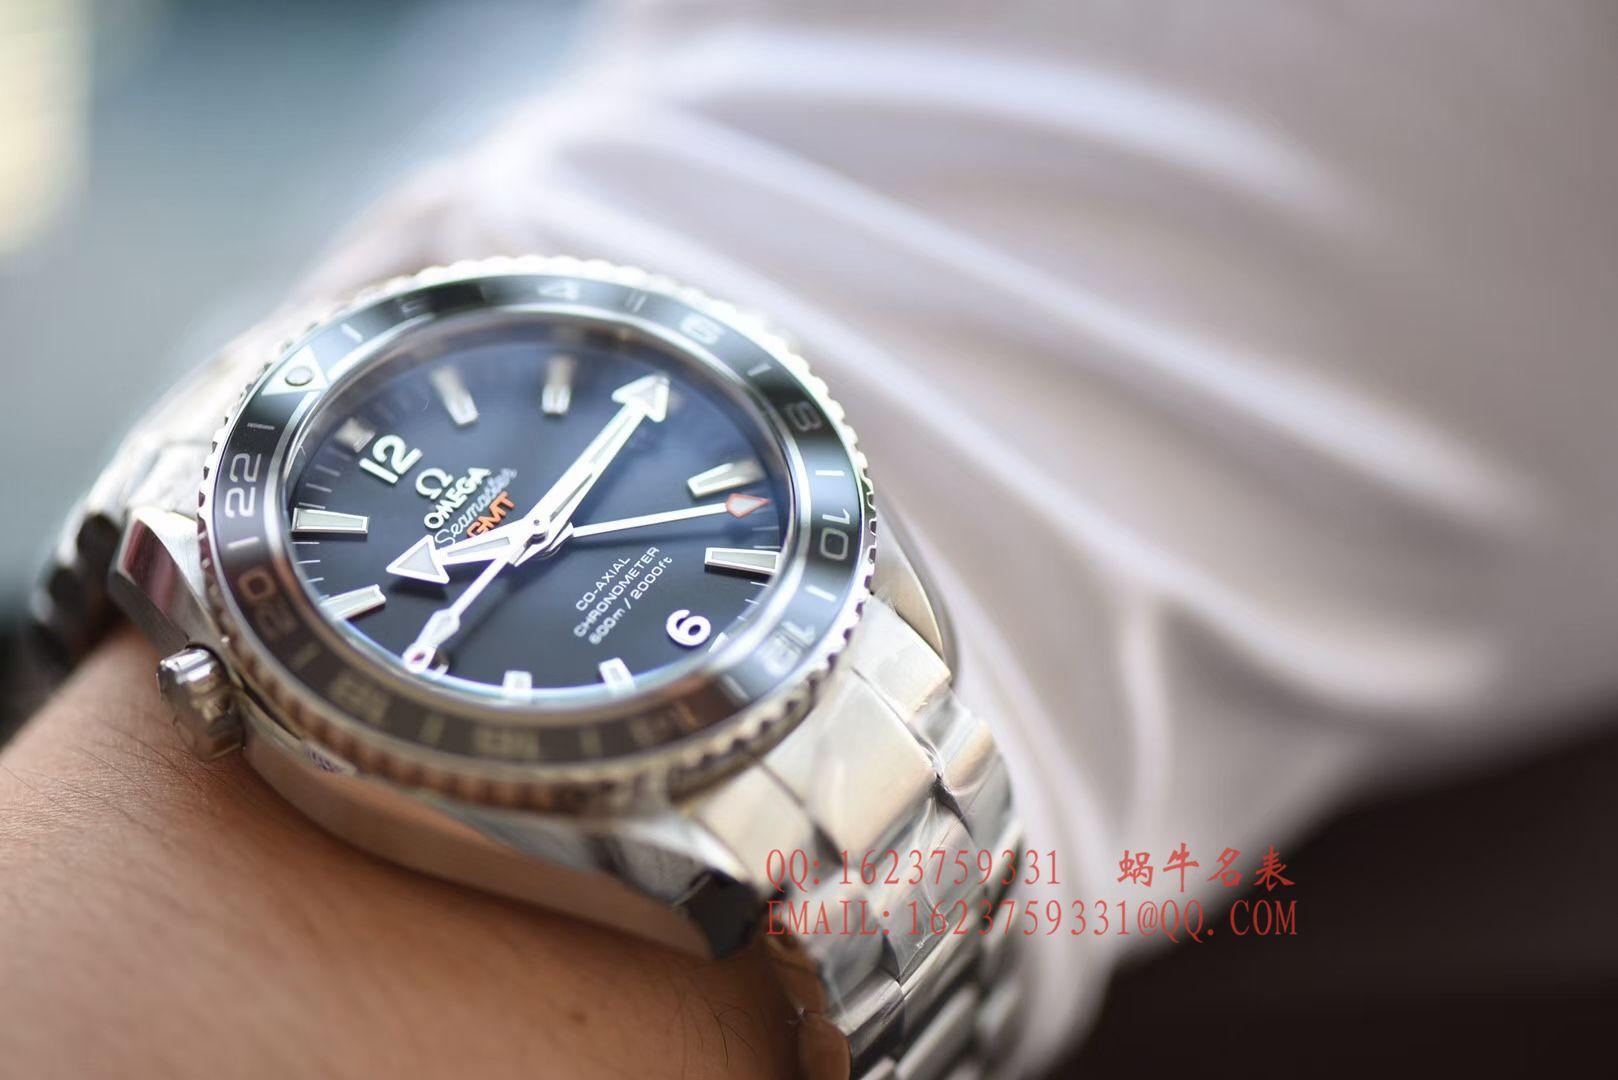 【KW一比一超A高仿手表】欧米茄 海马海洋宇宙600米232.30.44.22.01.001 GMT双时区腕表 / M046